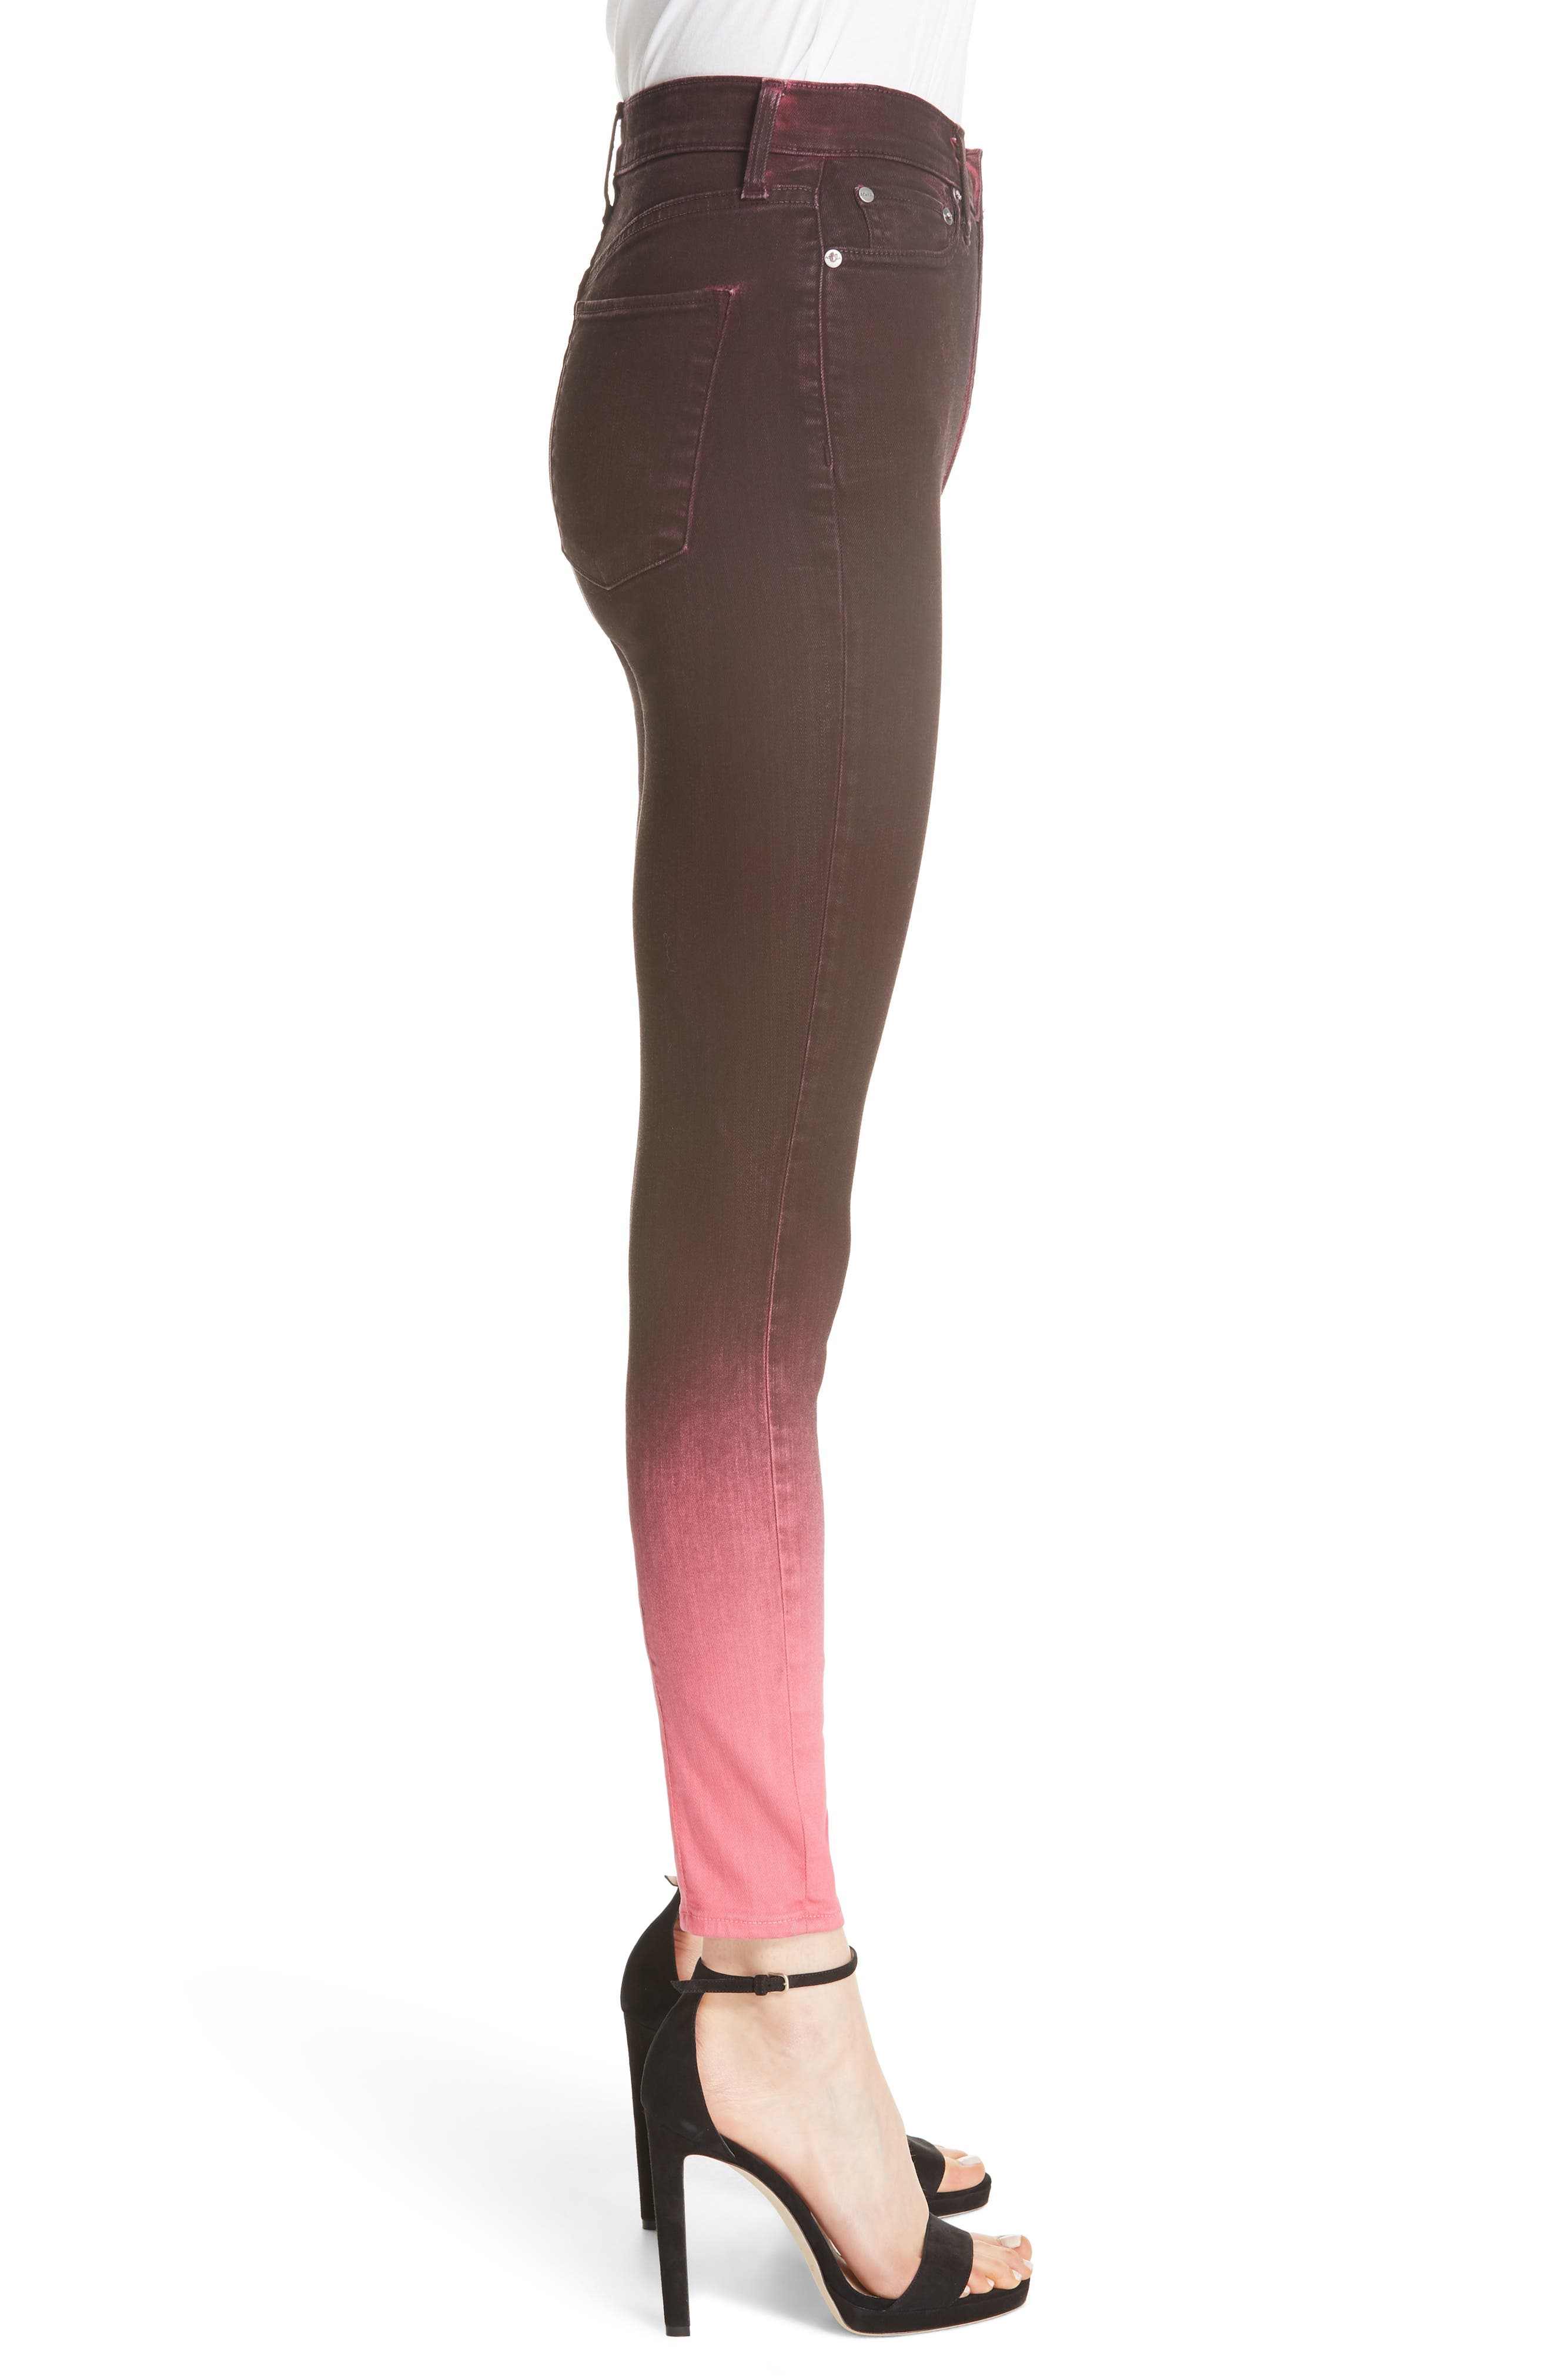 AO.LA Good High Waist Ankle Skinny Jeans,                             Alternate thumbnail 3, color,                             WINE/ BUBBLEGUM